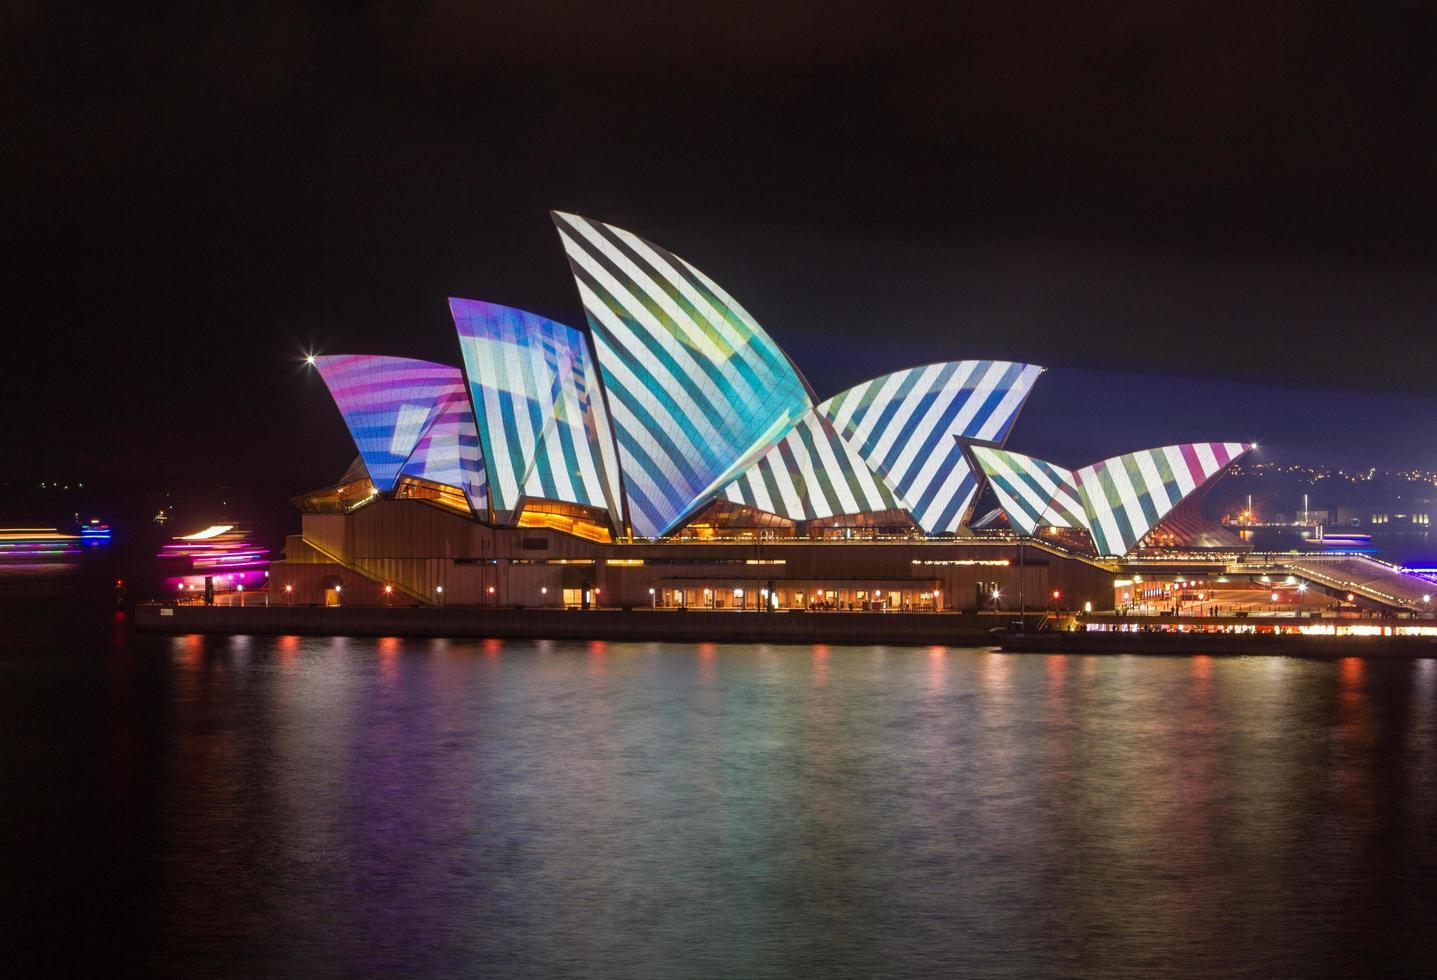 Sydney, Australia, 2020 - Light design on the Sydney Opera House at night photo